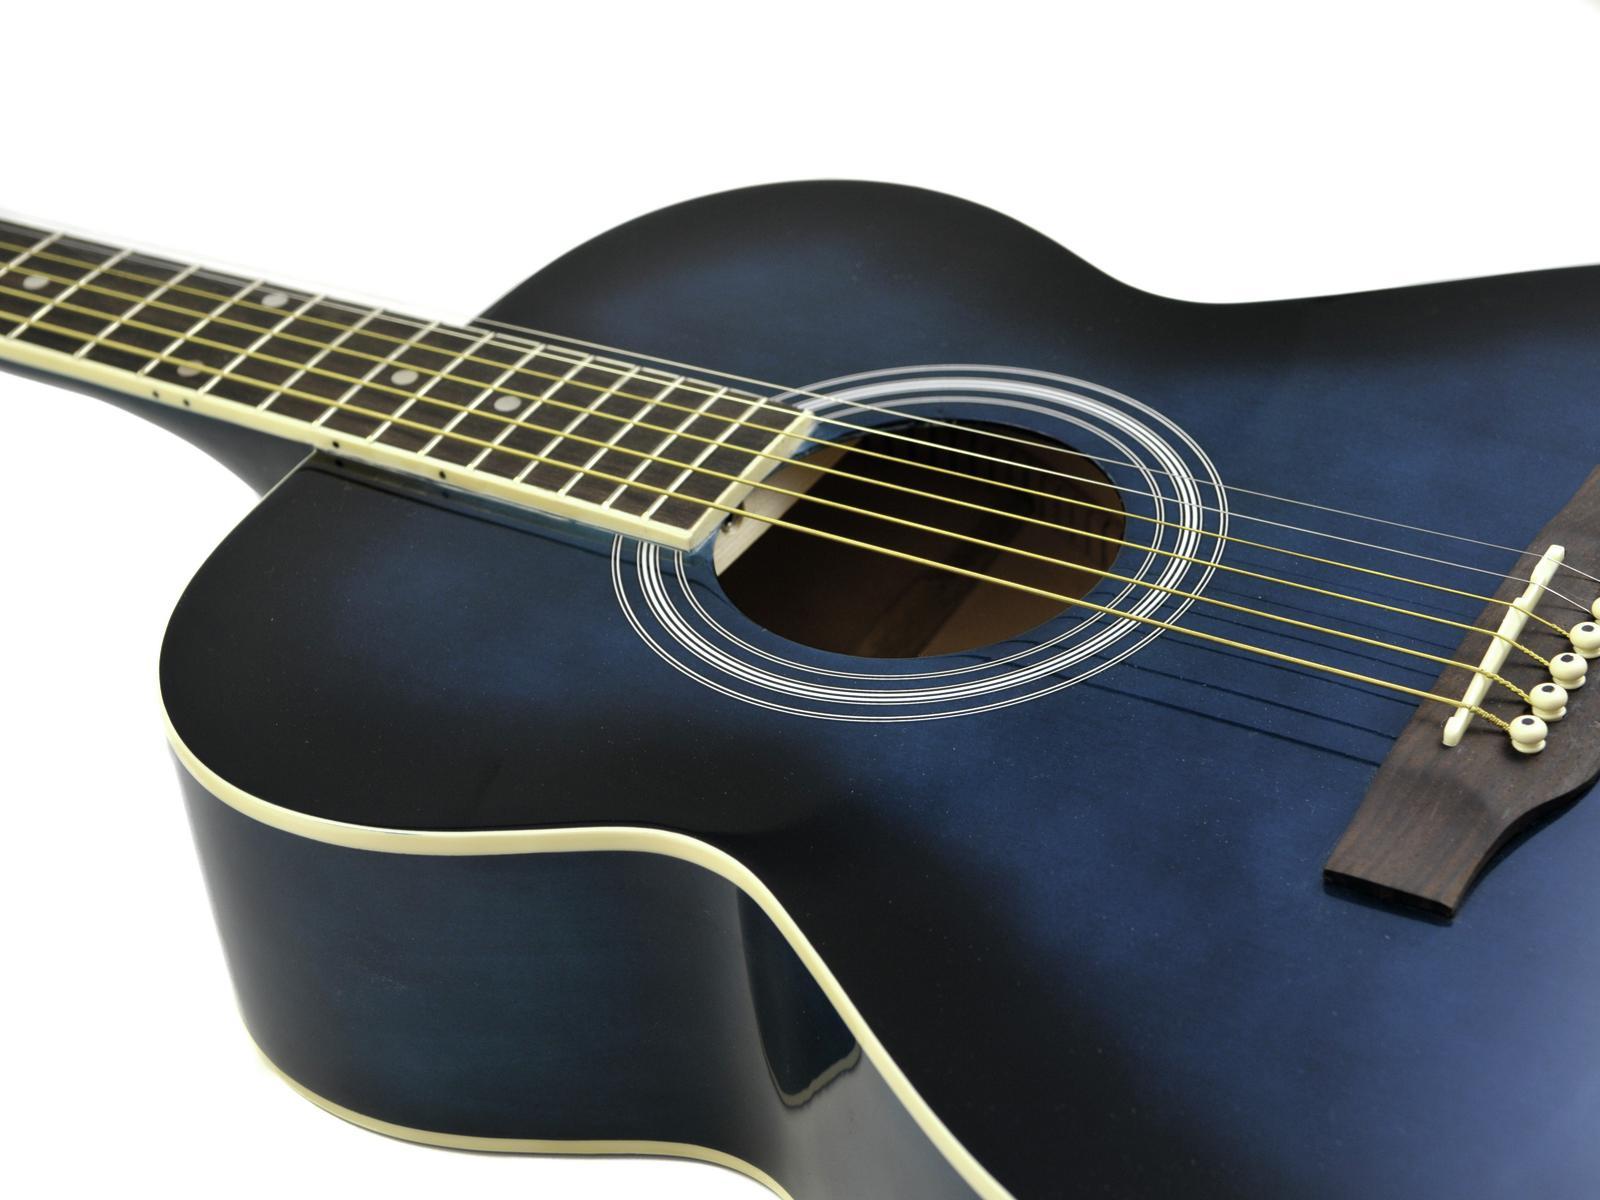 Chitarra acustica, western, colore blueburst, acero, DIMAVERY AW-303